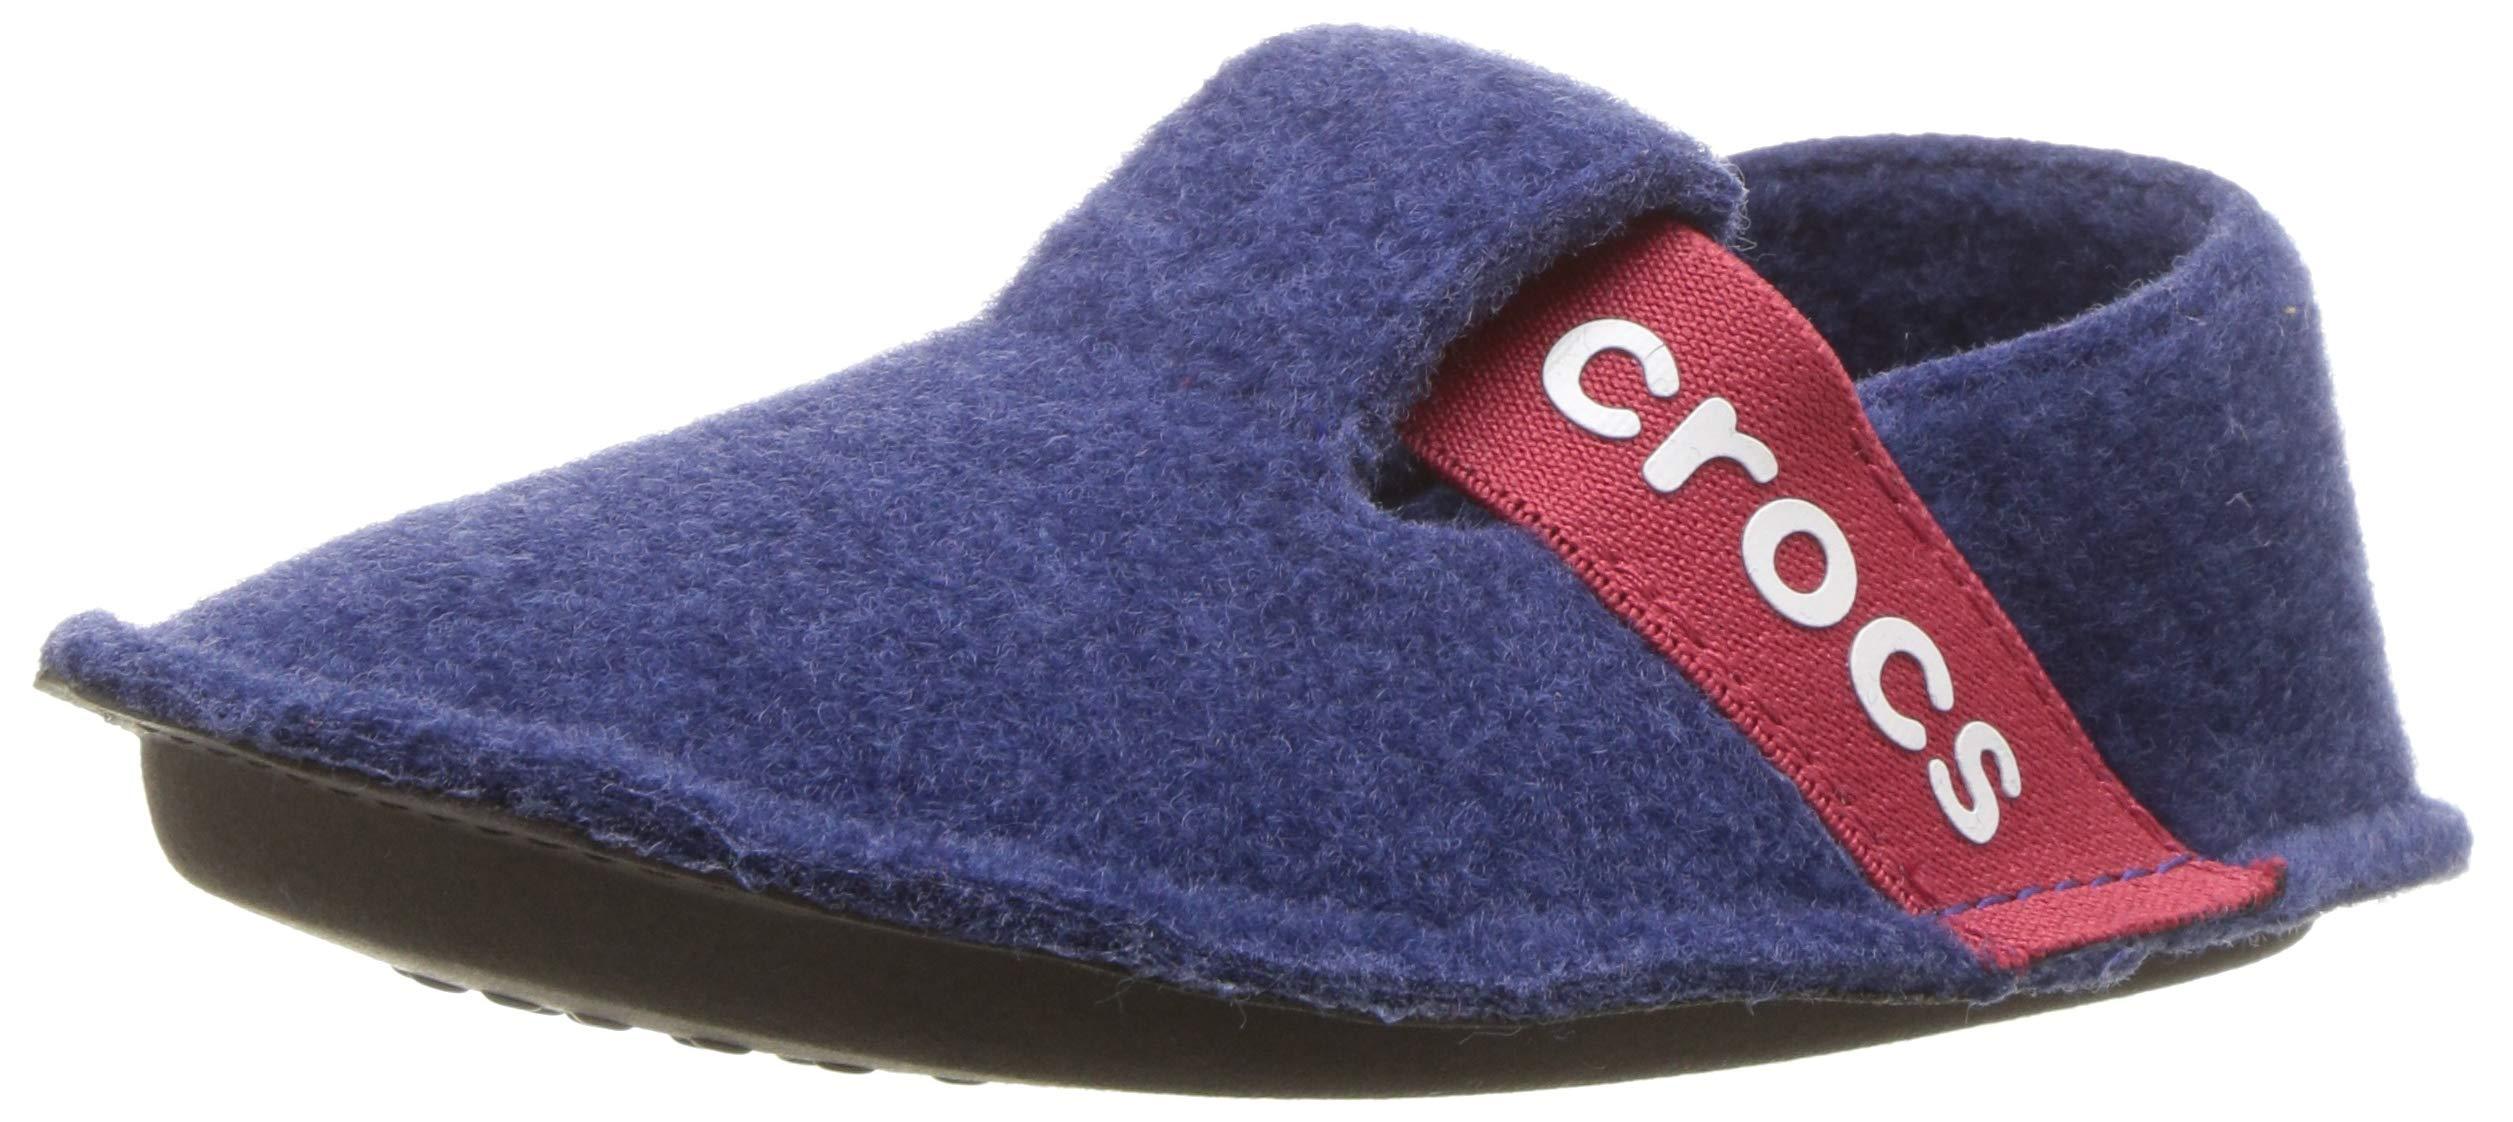 crocs Baby Kids' Classic Slipper, Cerulean Blue, 7 M US Toddler